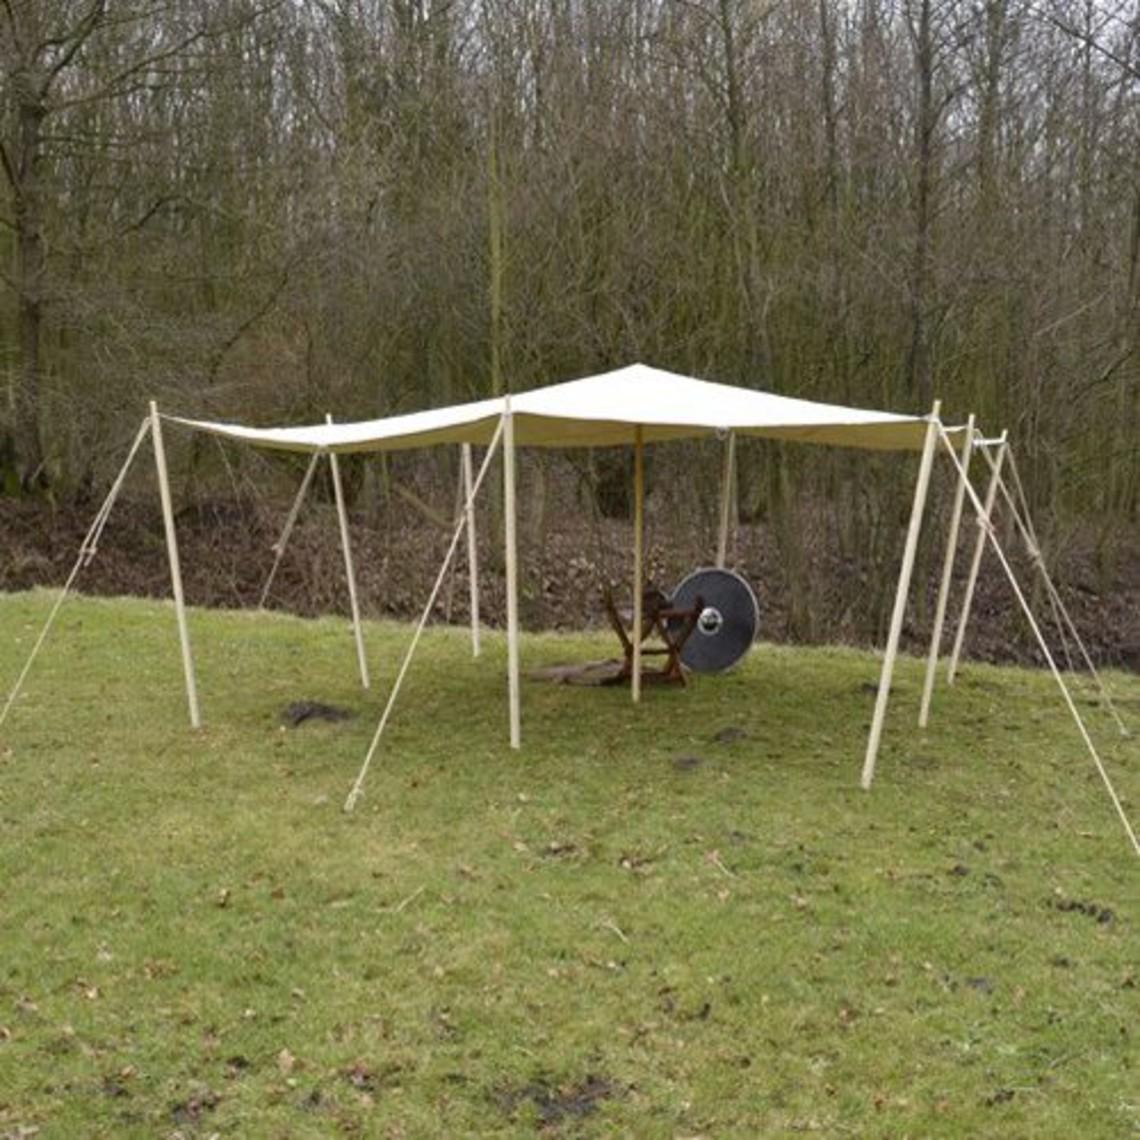 Luifel 4 x 4 m 350 g/m²